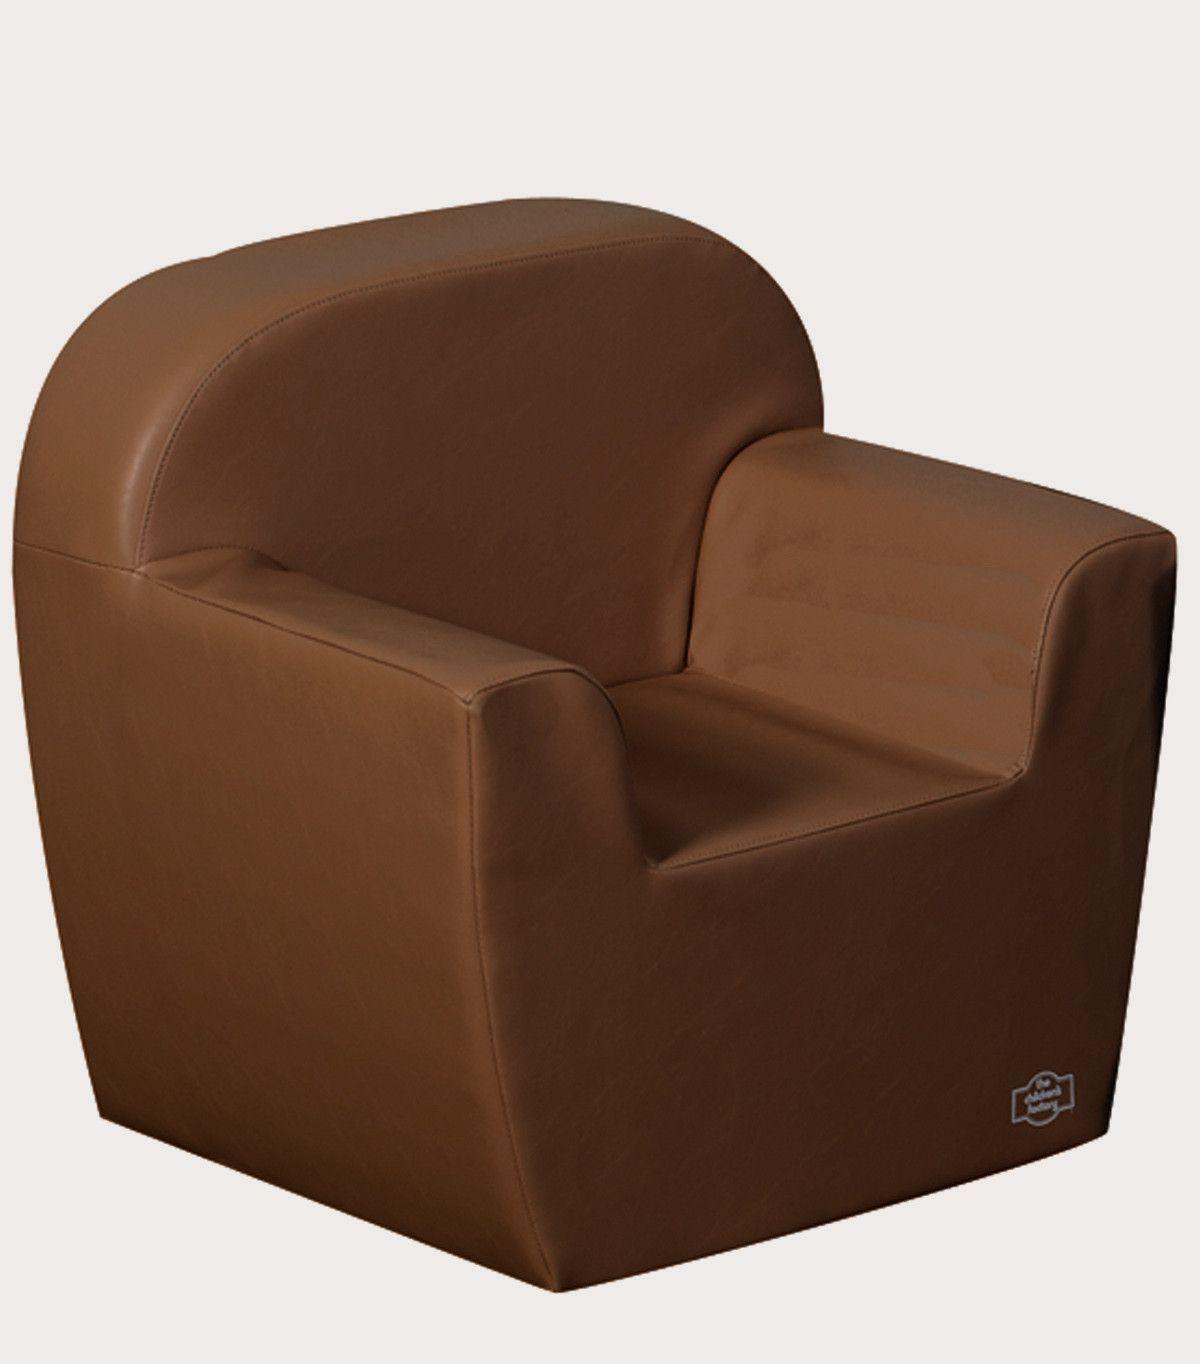 CF705-594 Club Chair - Dark Walnut Brown